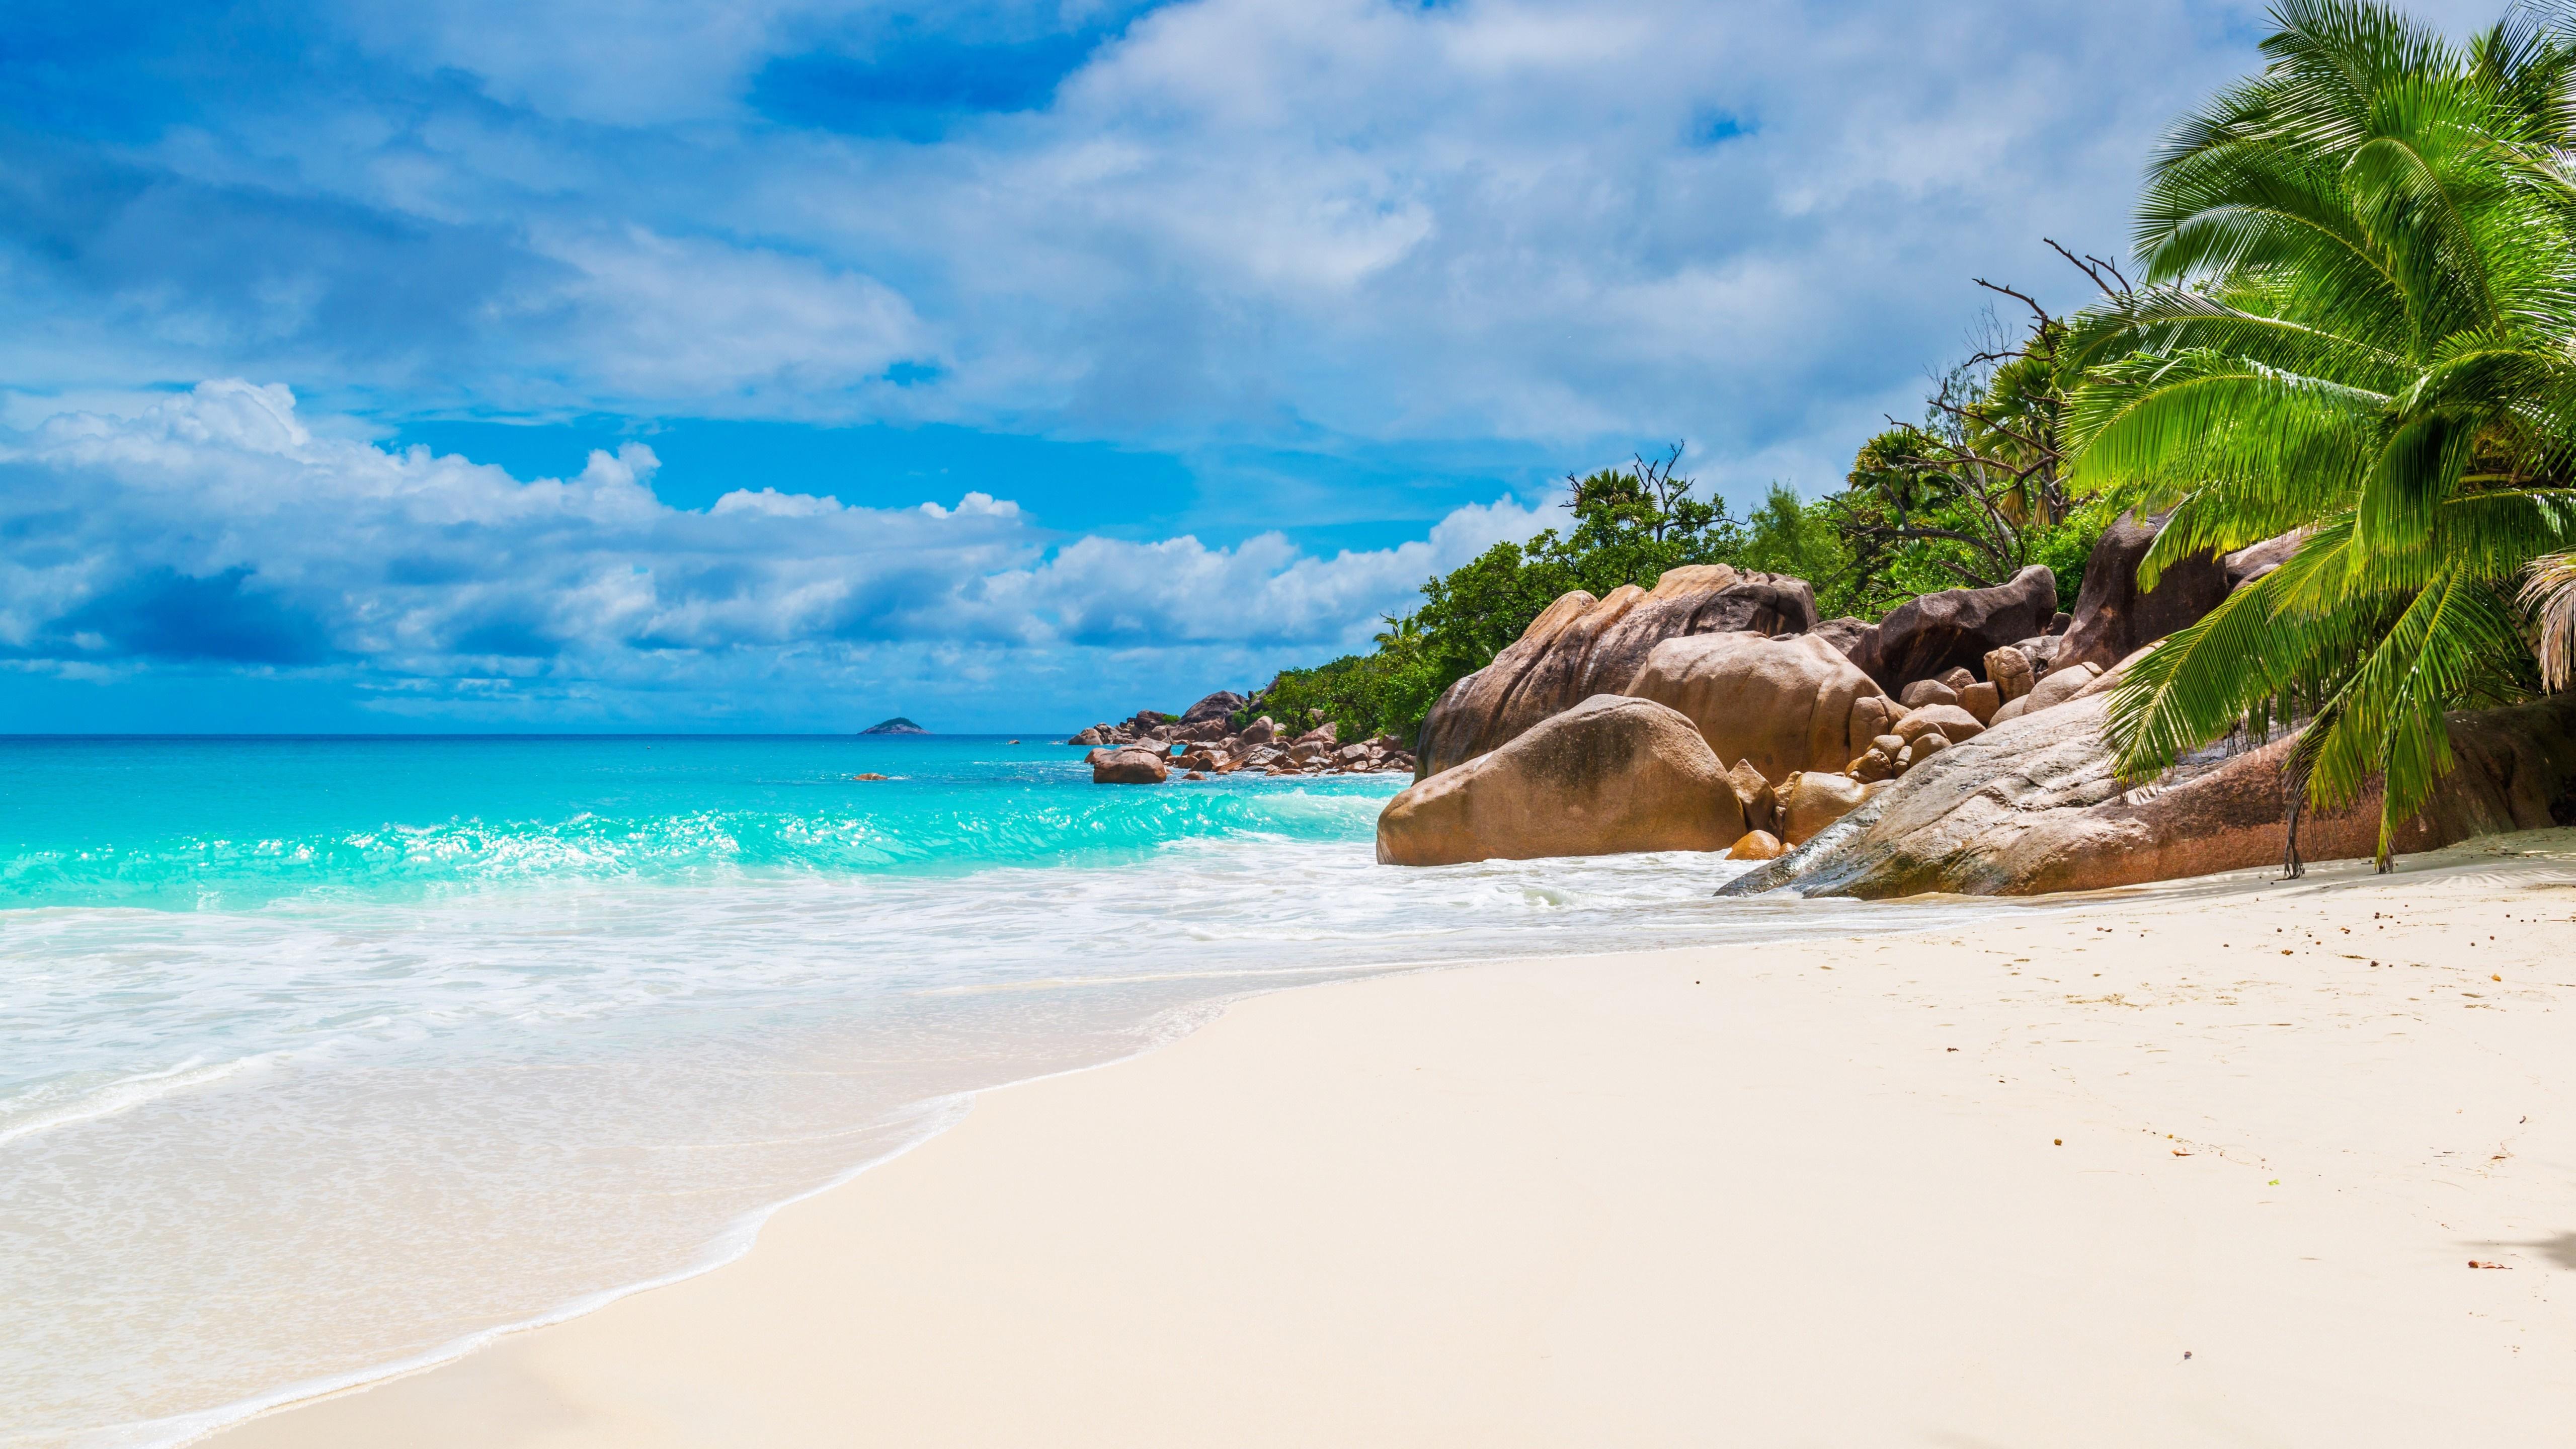 Tropical sandy beach 🌴 wallpaper